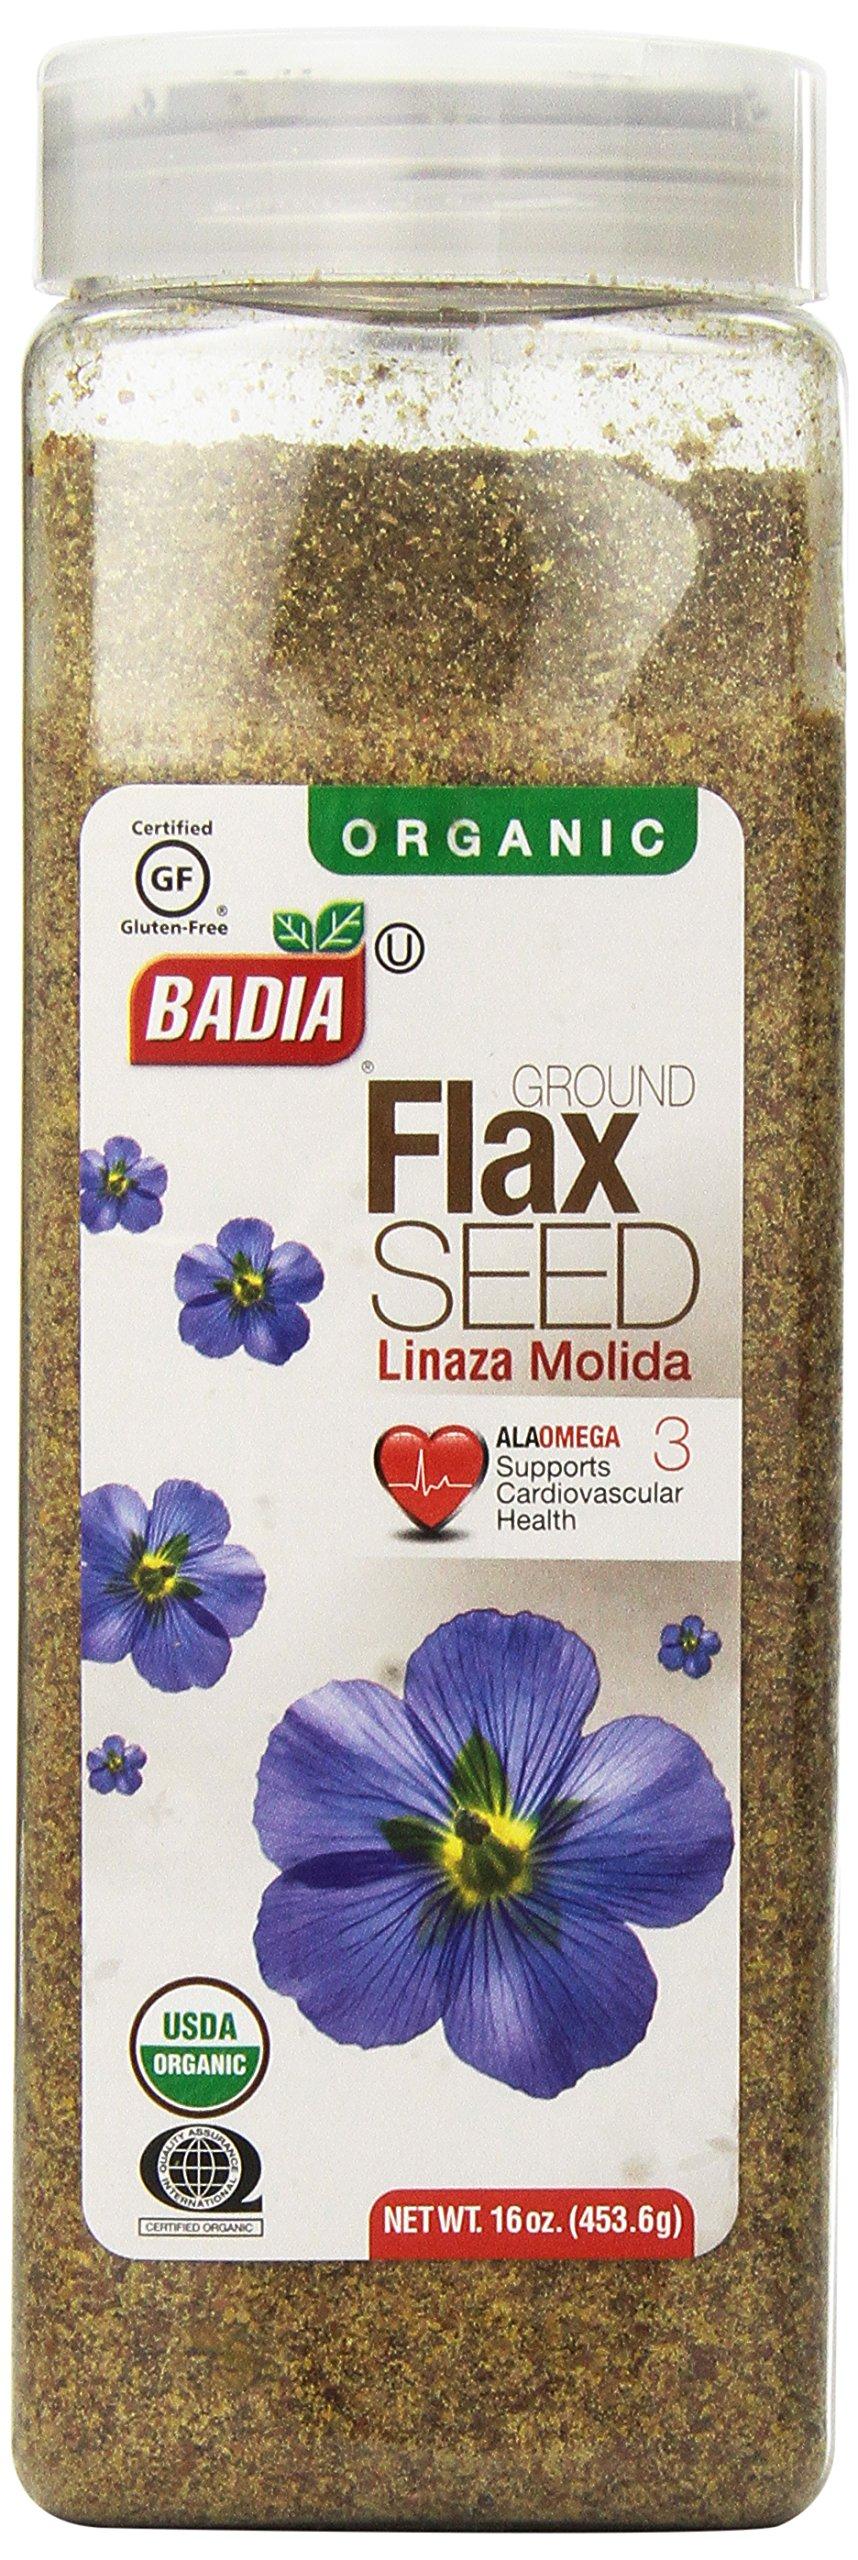 Badia Organic Flax Seed, Ground, 16-Ounce